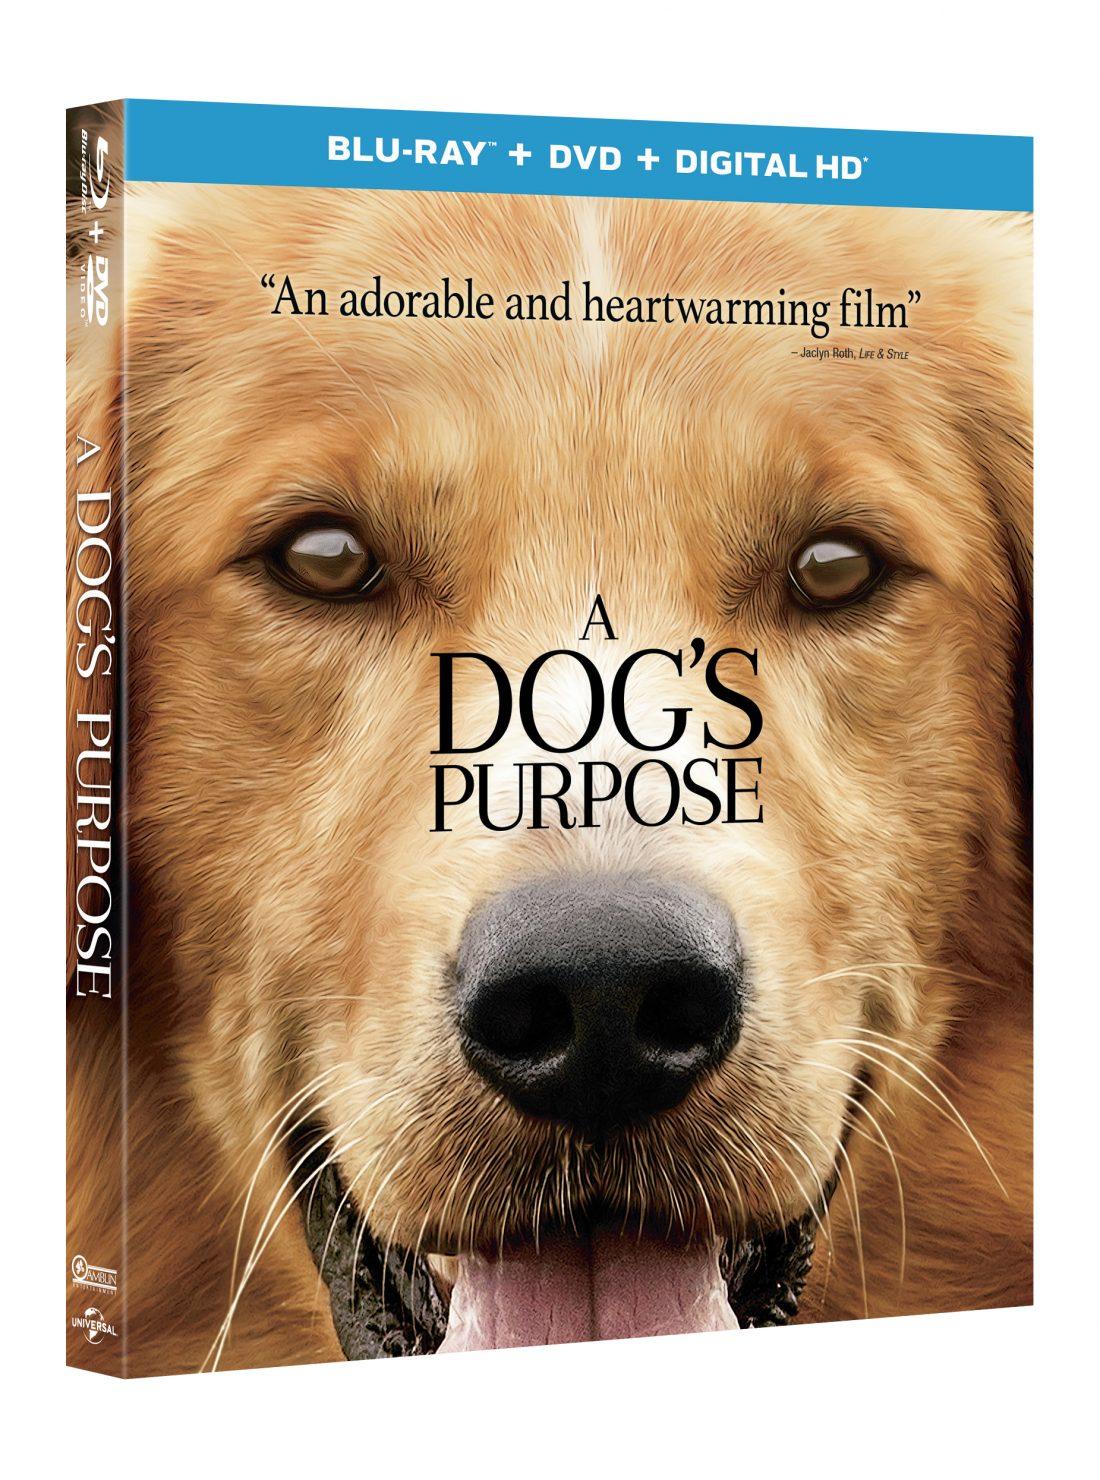 A Dog S Purpose Blu Ray Dvd Digital Hd